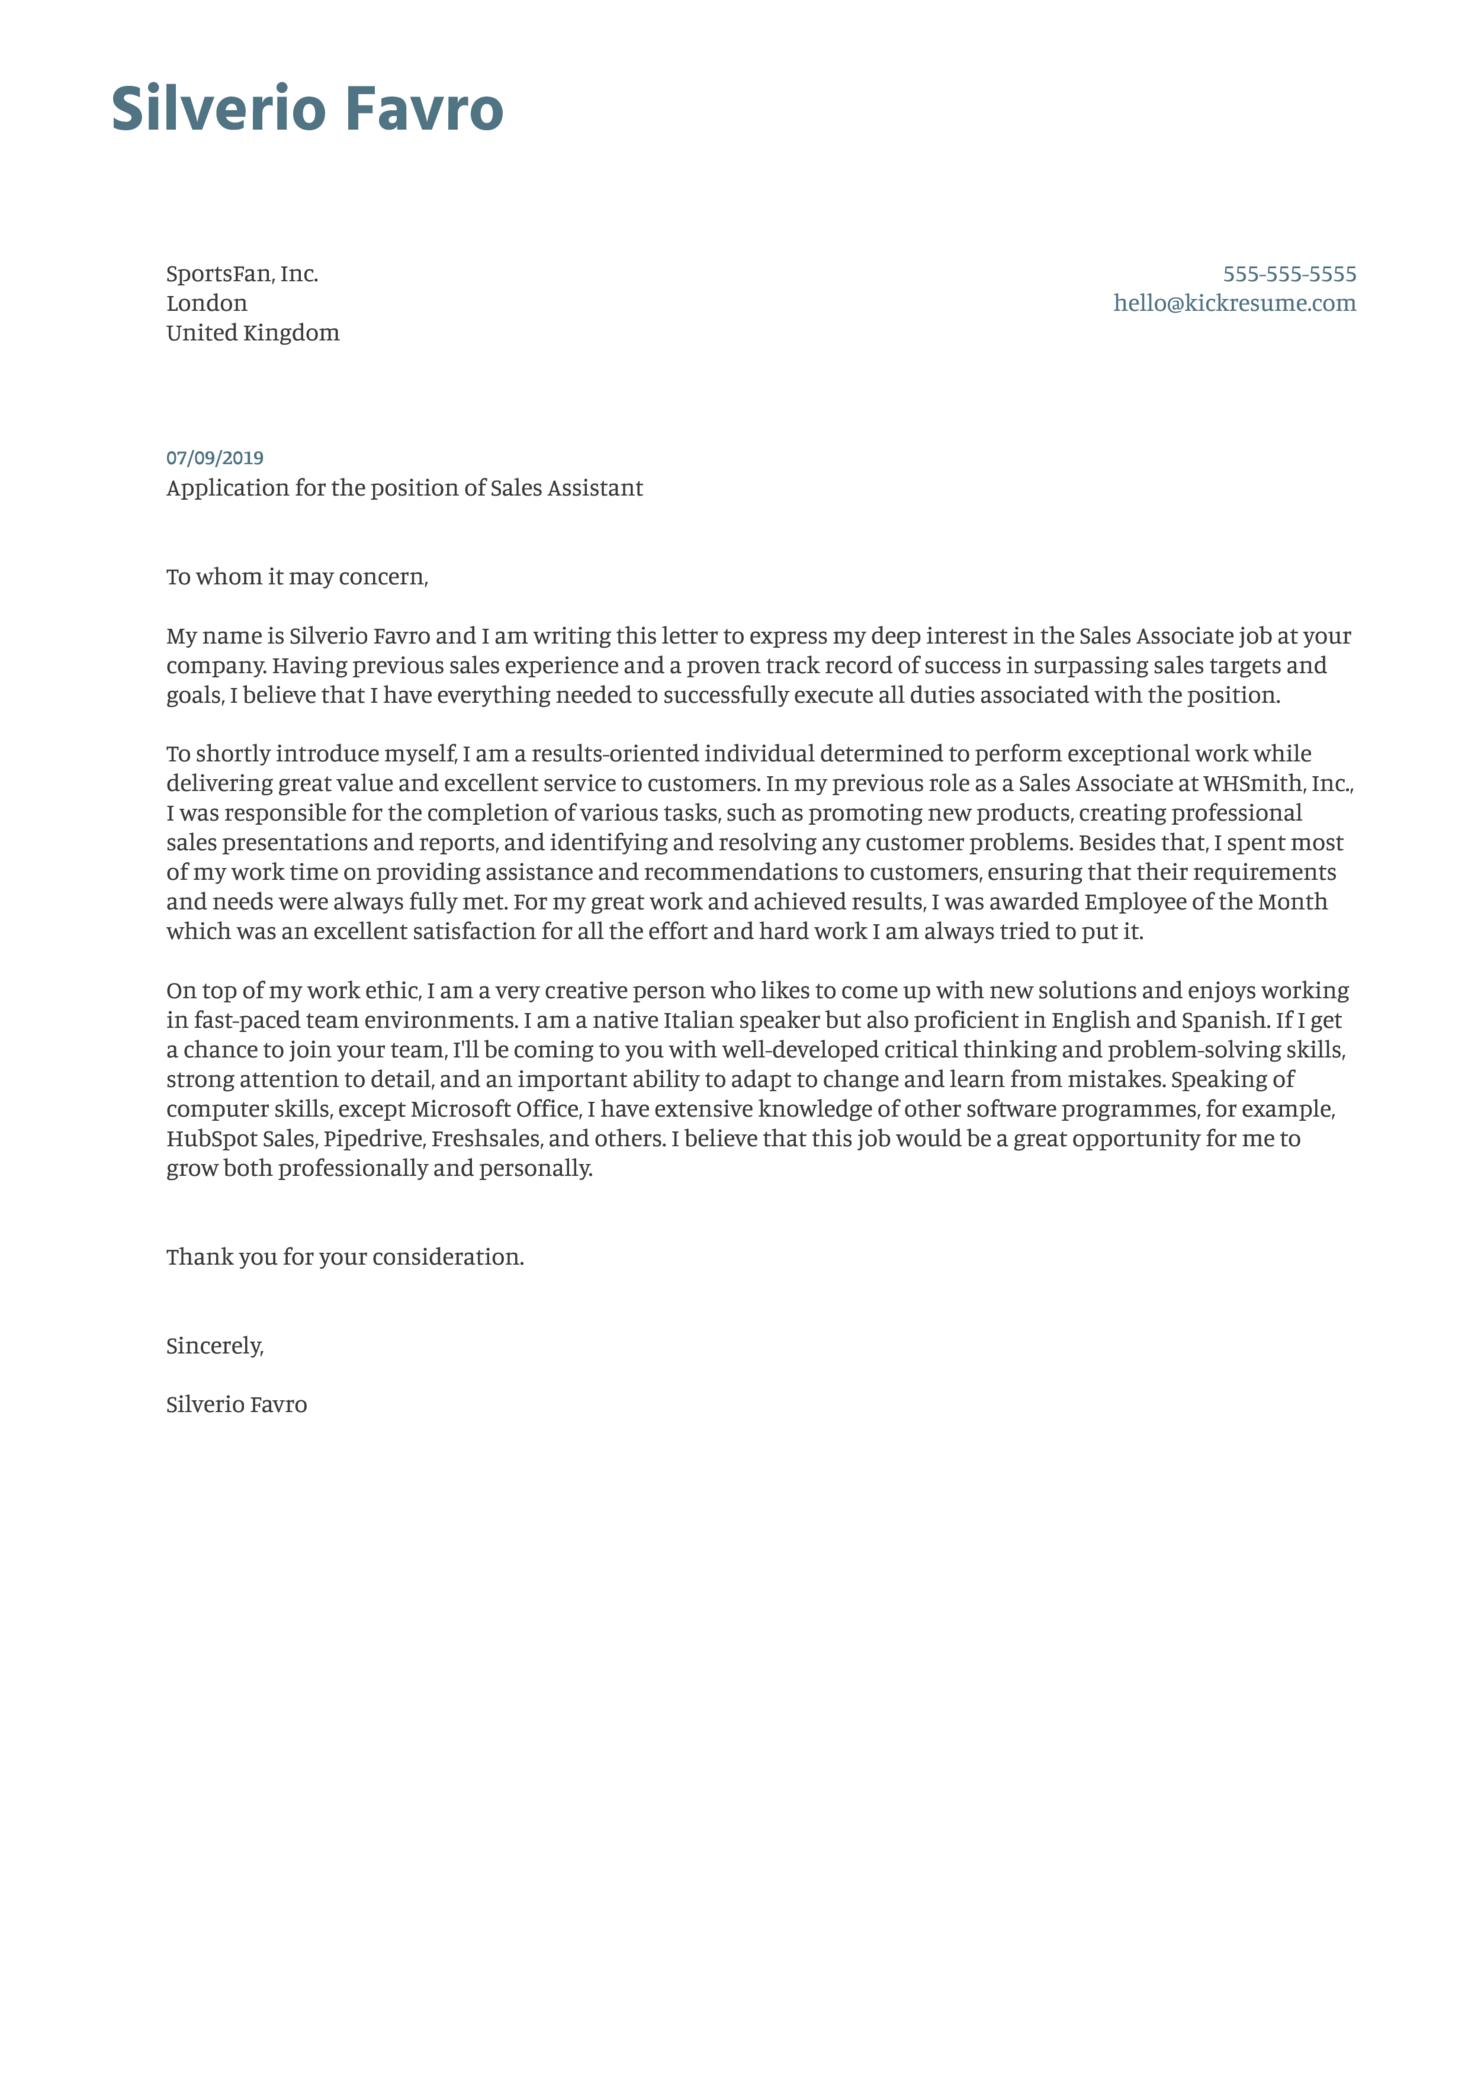 Sales Assistant Cover Letter Sample